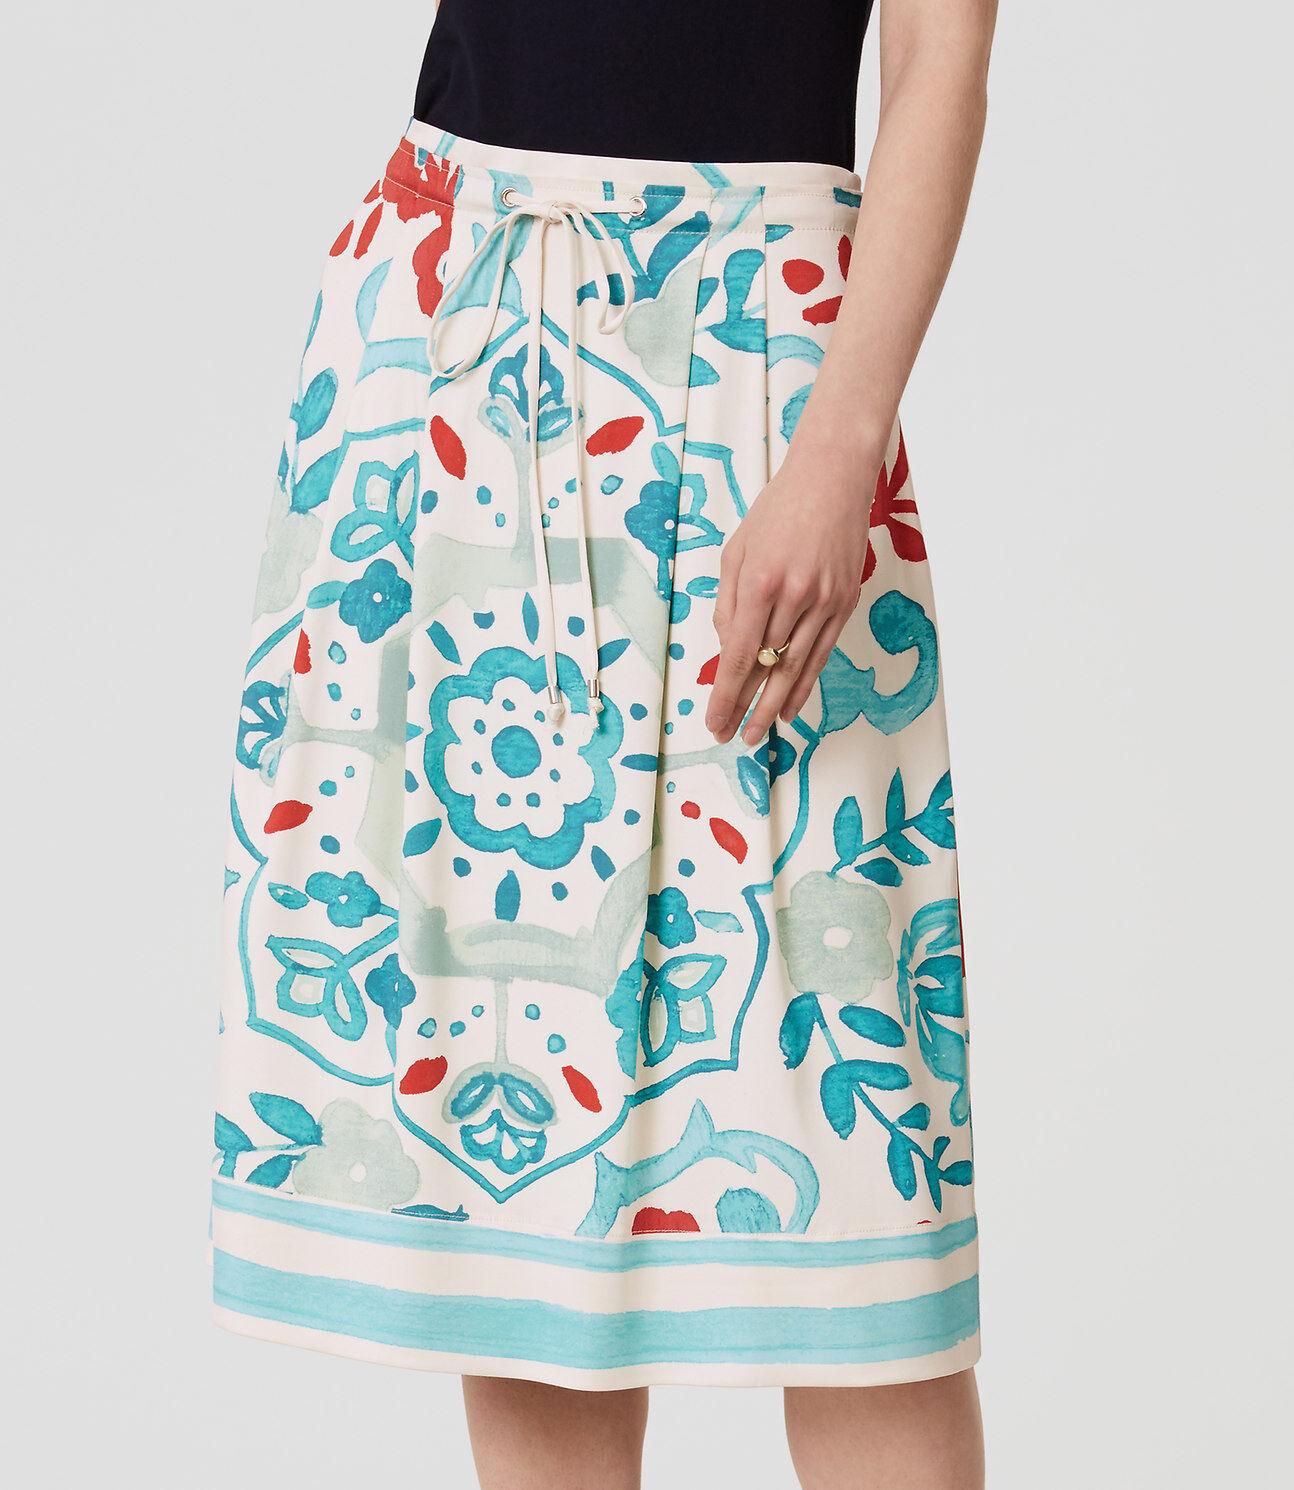 Ann Taylor LOFT - Womens 00 (XXS) Floral Print Pull-on Drawstring Skirt